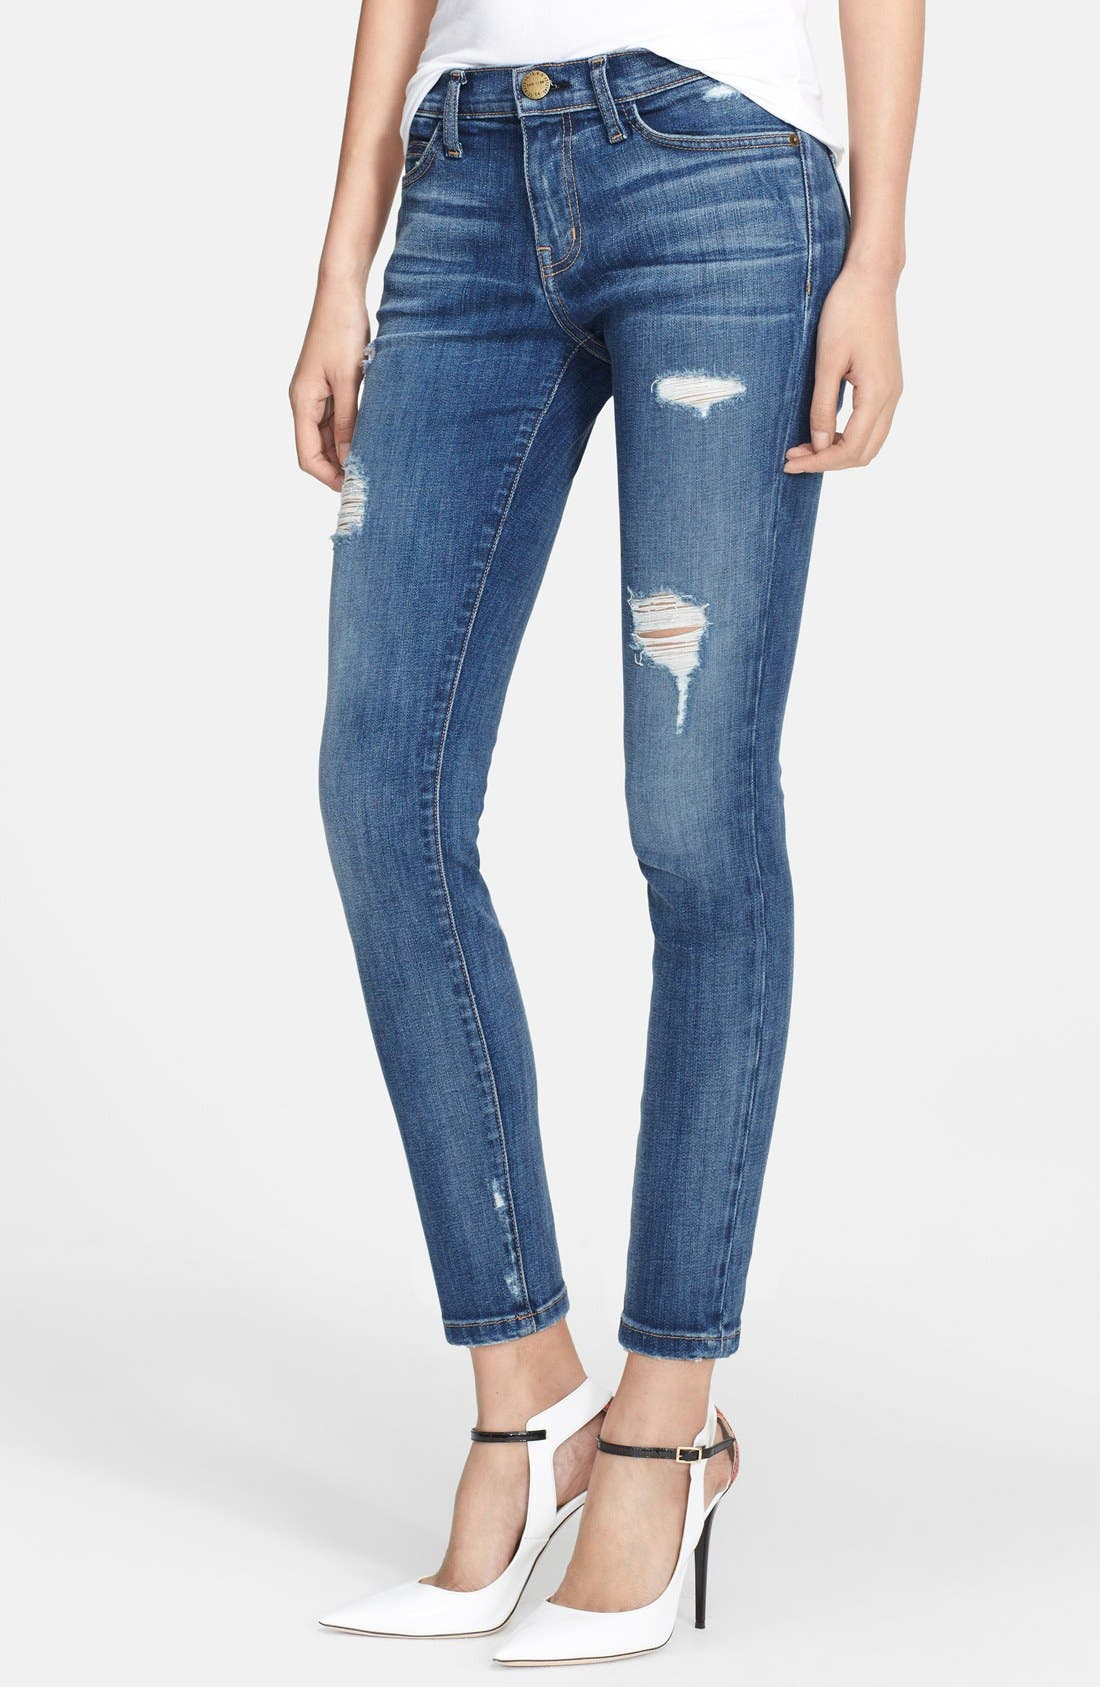 Current/Elliott 'The Stiletto' Destroyed Skinny Jeans (Niagara Destroy) (Nordstrom Exclusive)